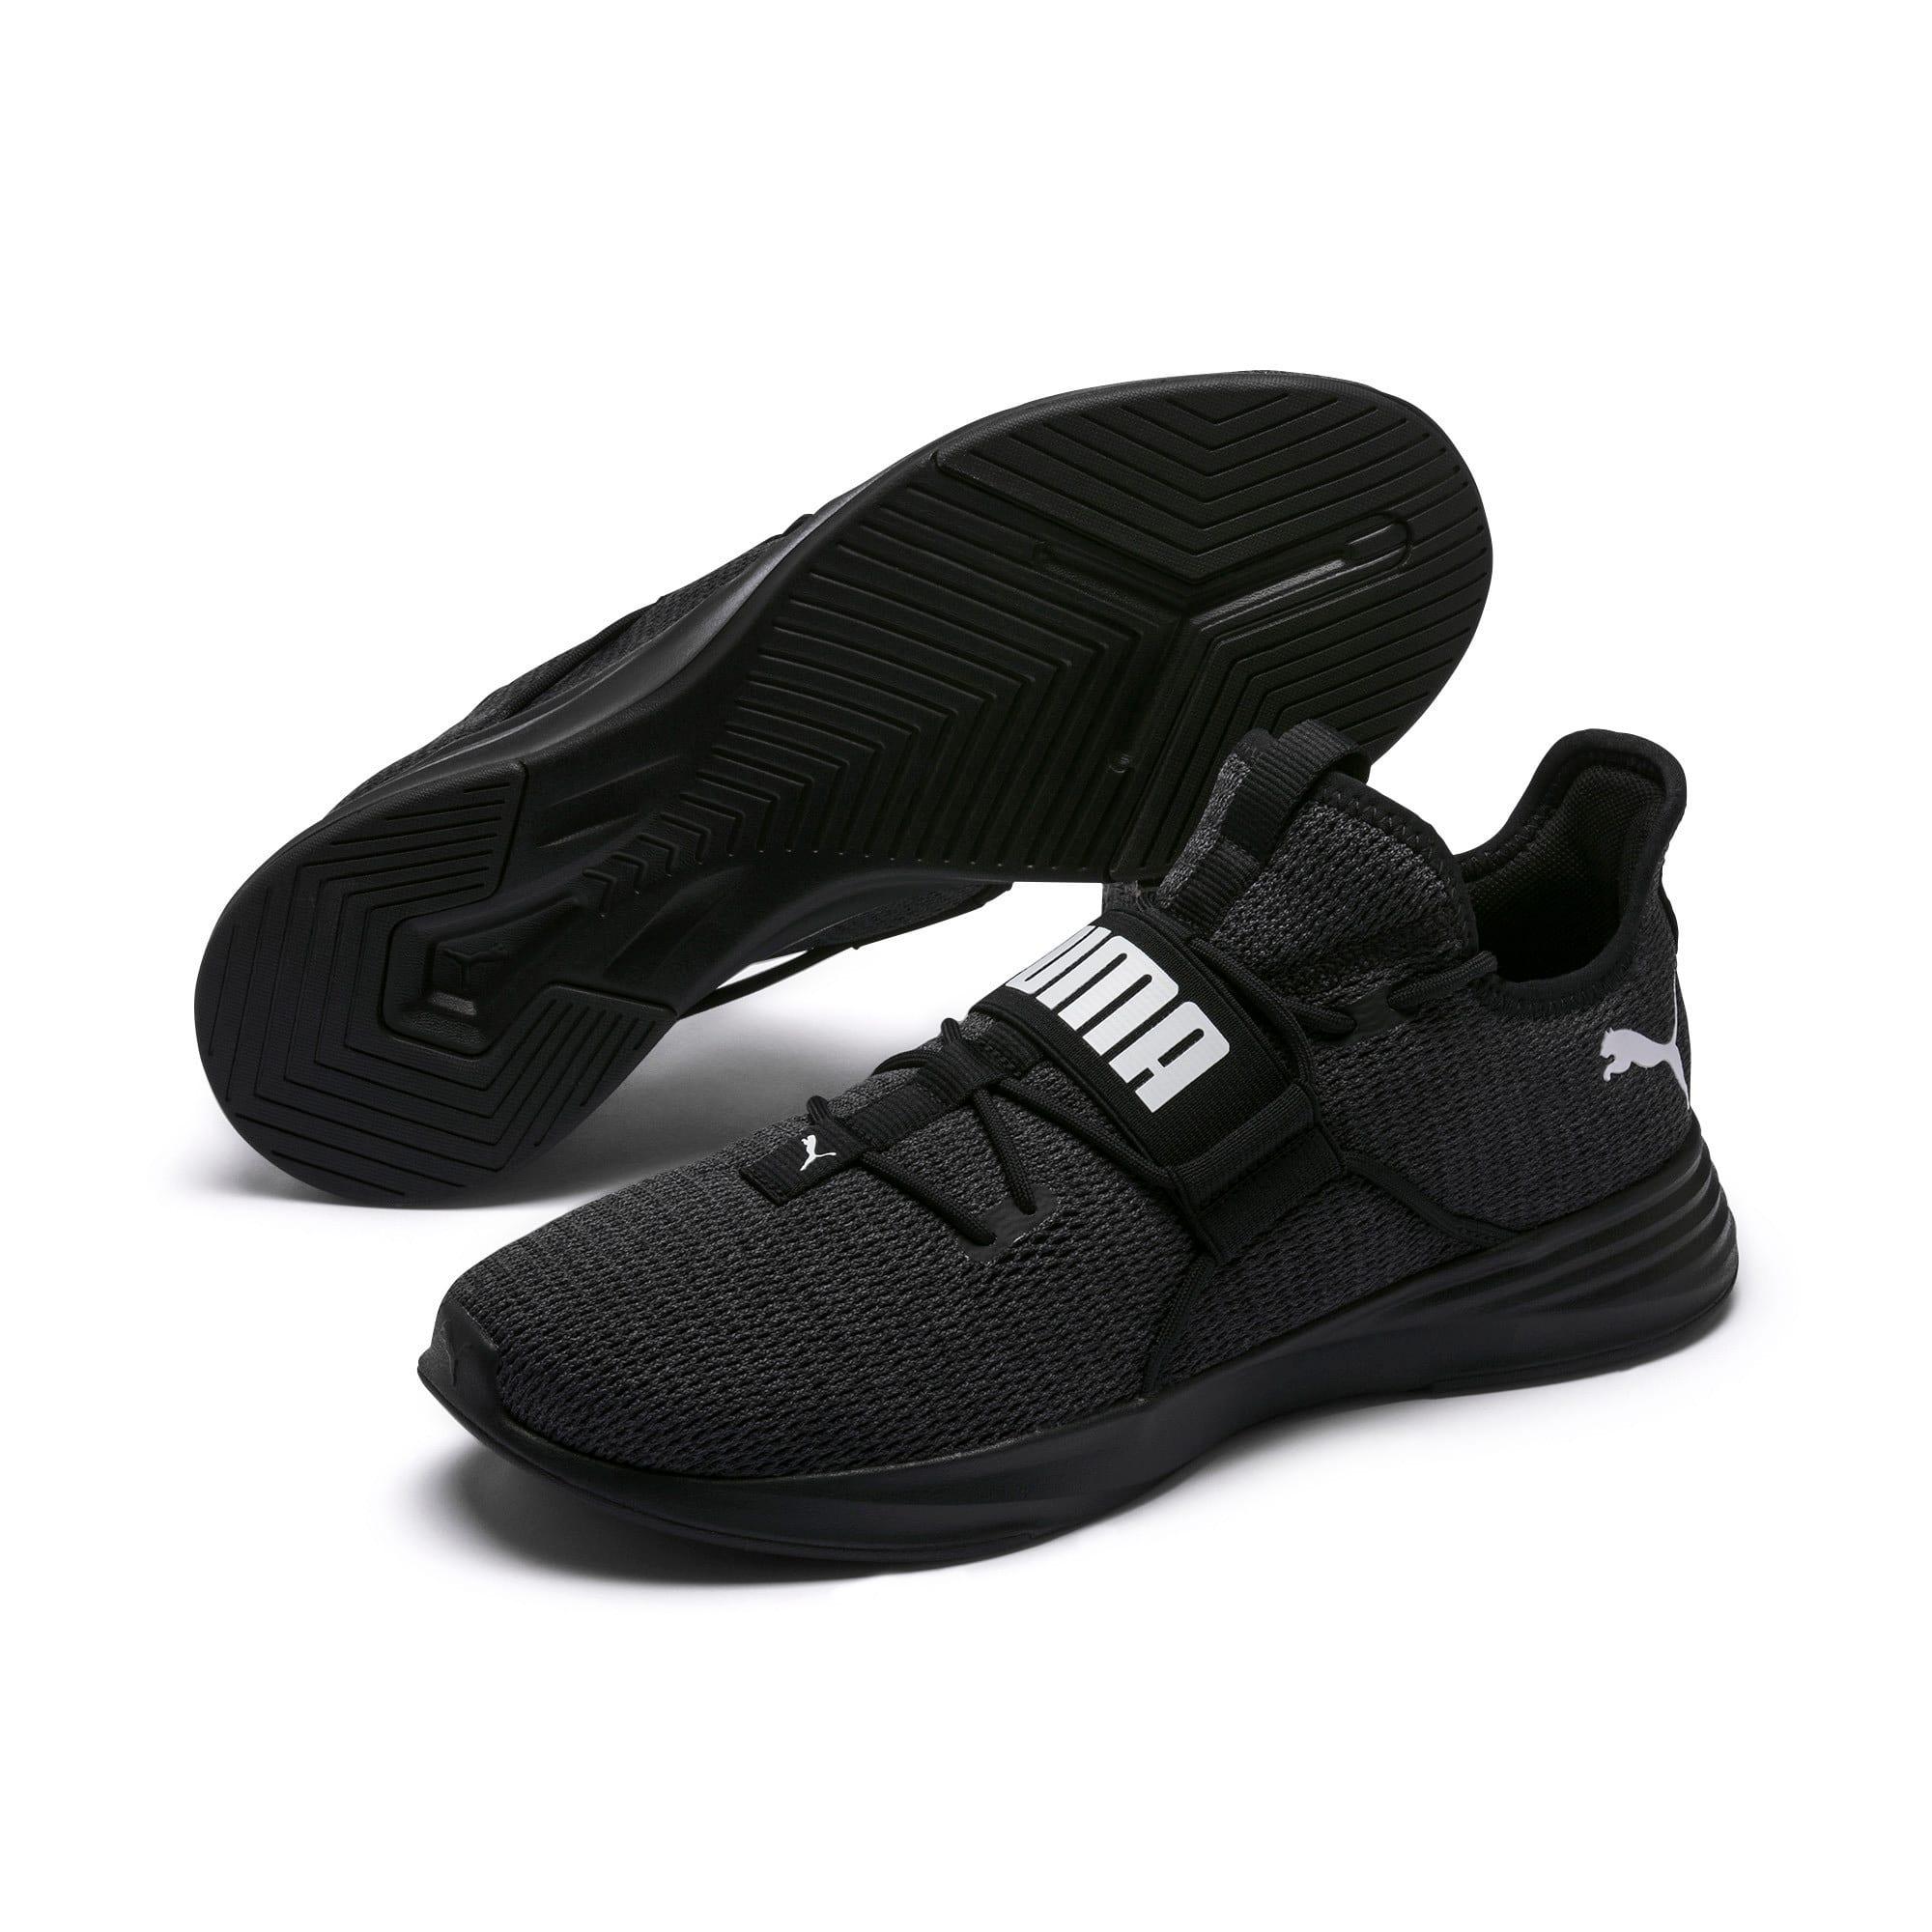 Thumbnail 2 of Persist XT Men's Training Shoes, Puma Black-Asphalt, medium